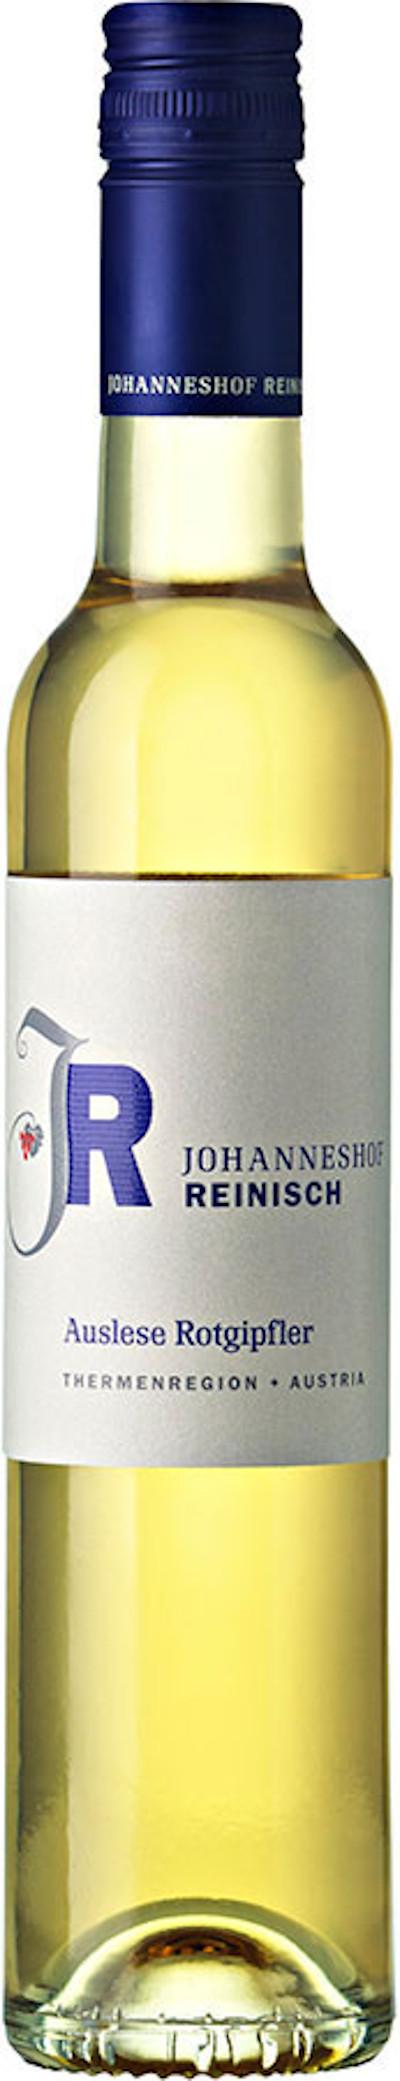 Johanneshof Reinisch - Rotgipfler Auslese bio